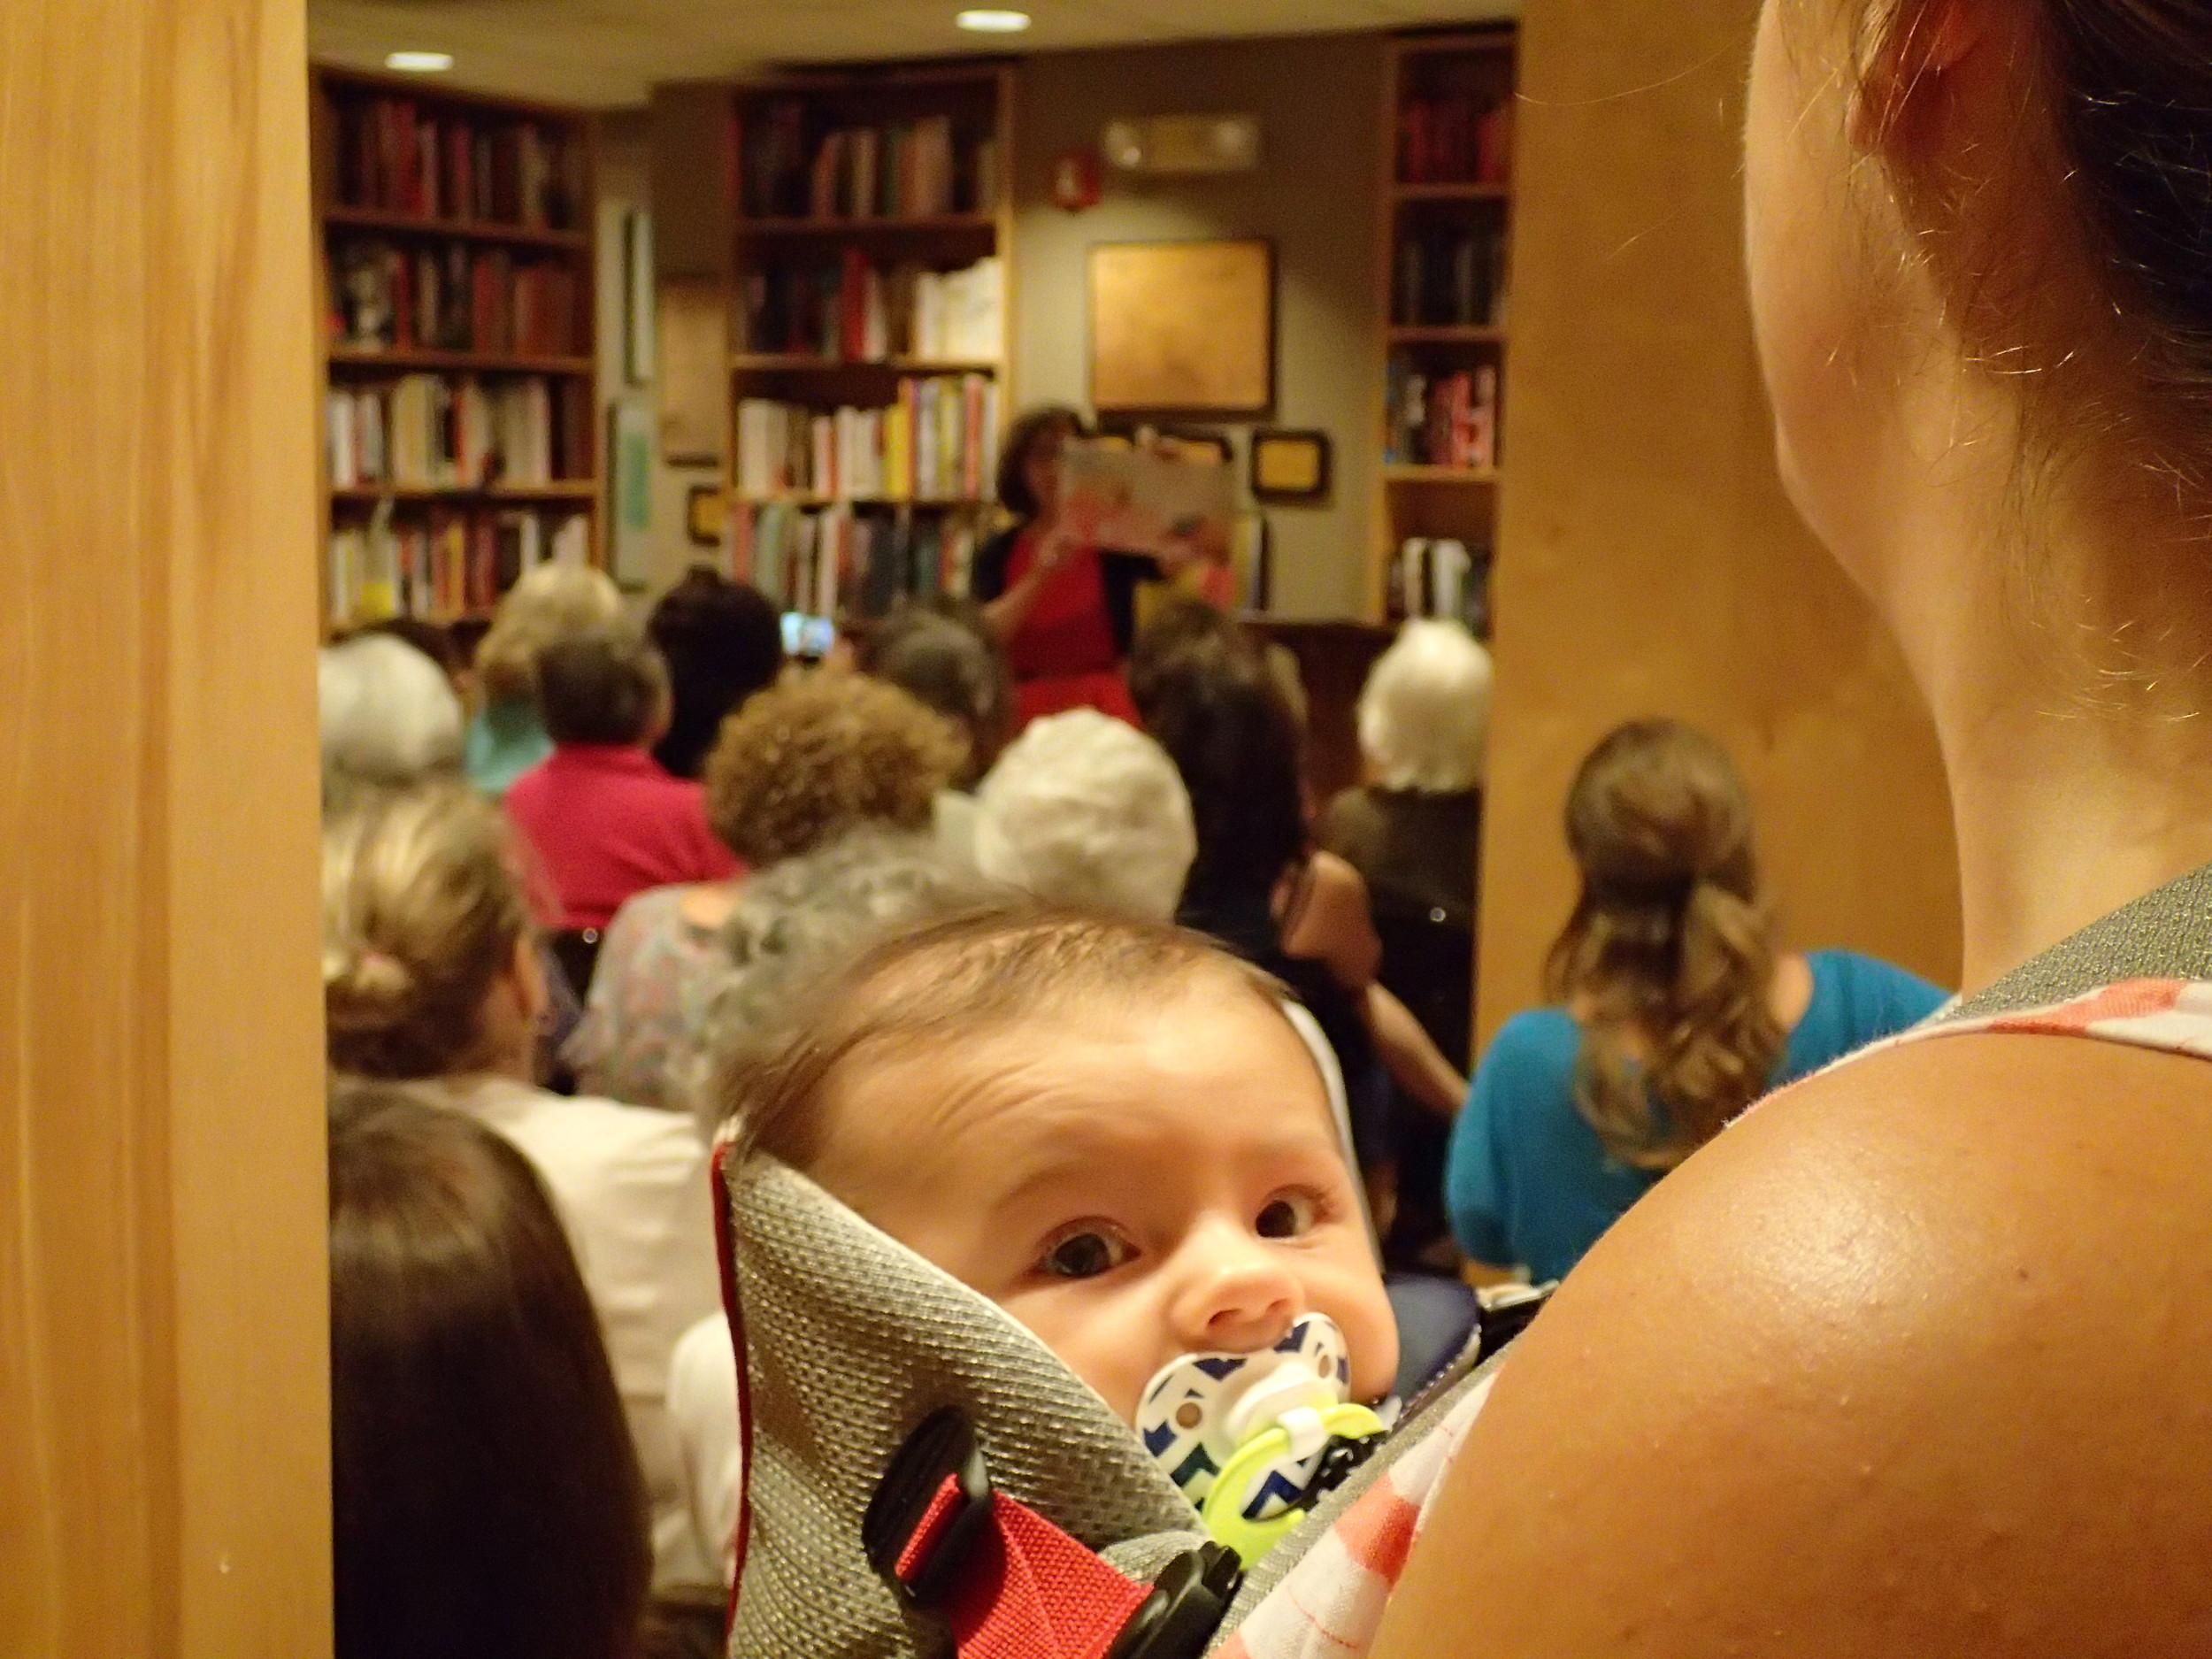 Future Charlotte reader?